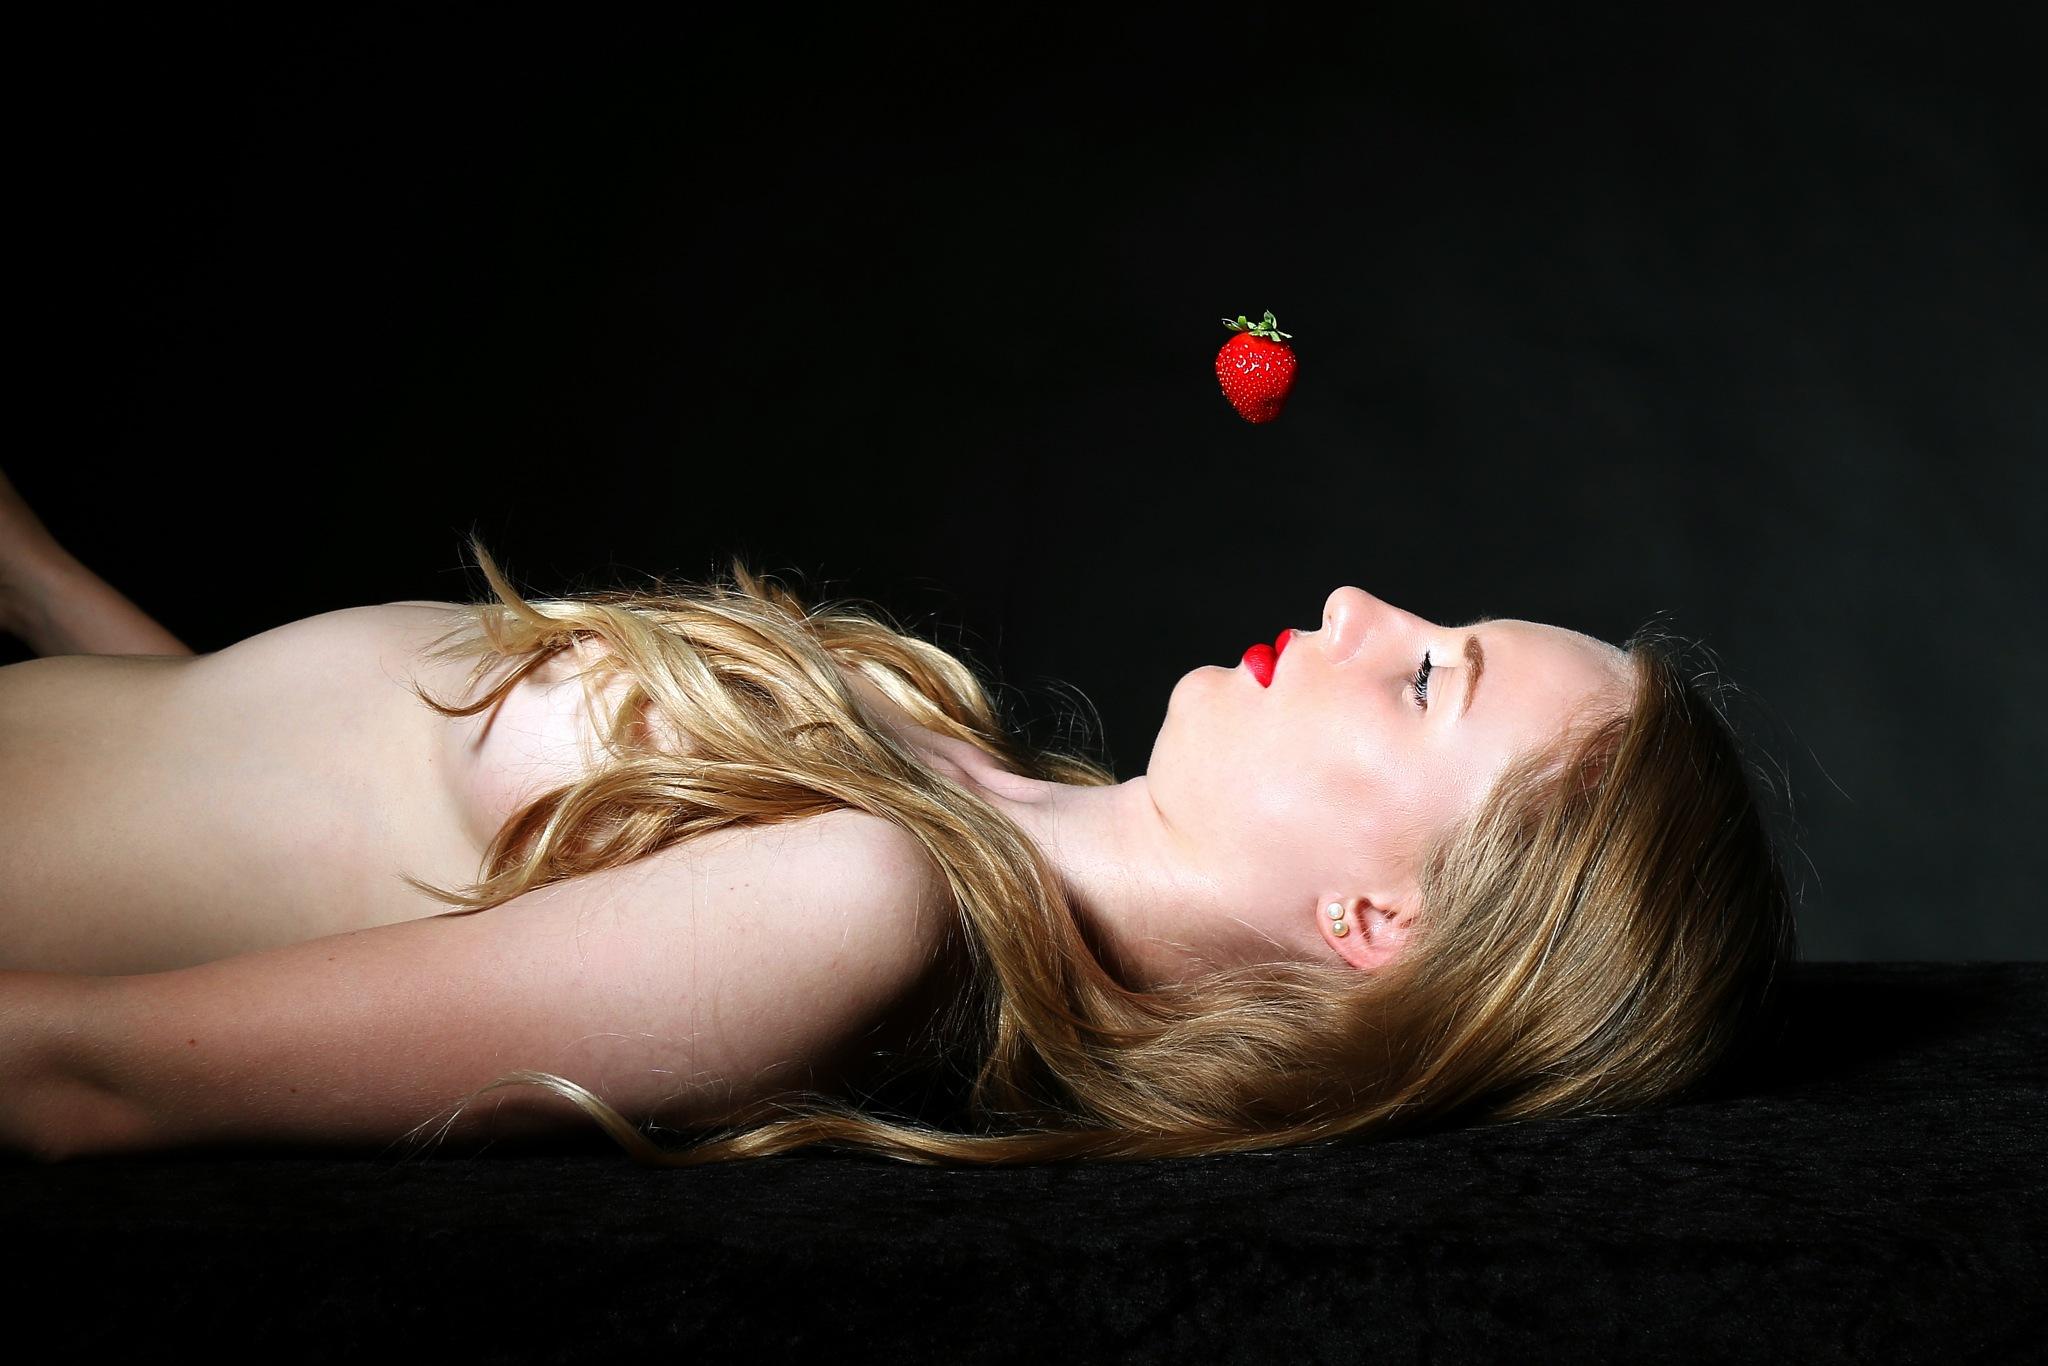 Falling Strawberry by Kim Fini Larsen